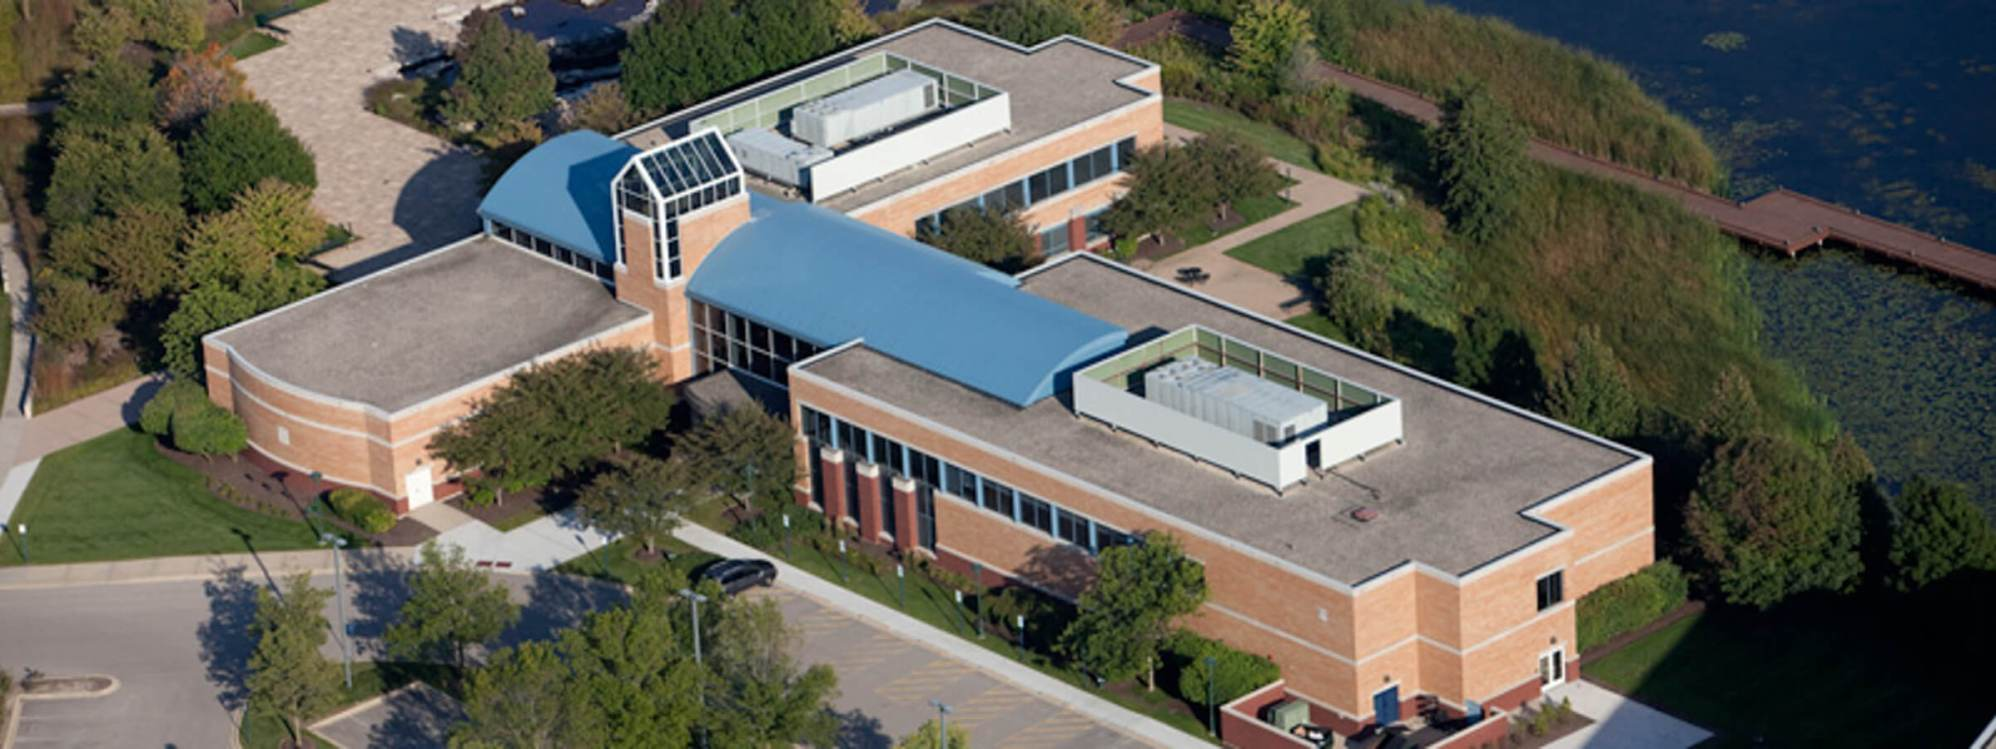 NIU Hoffman estates Meeting & Conference Center